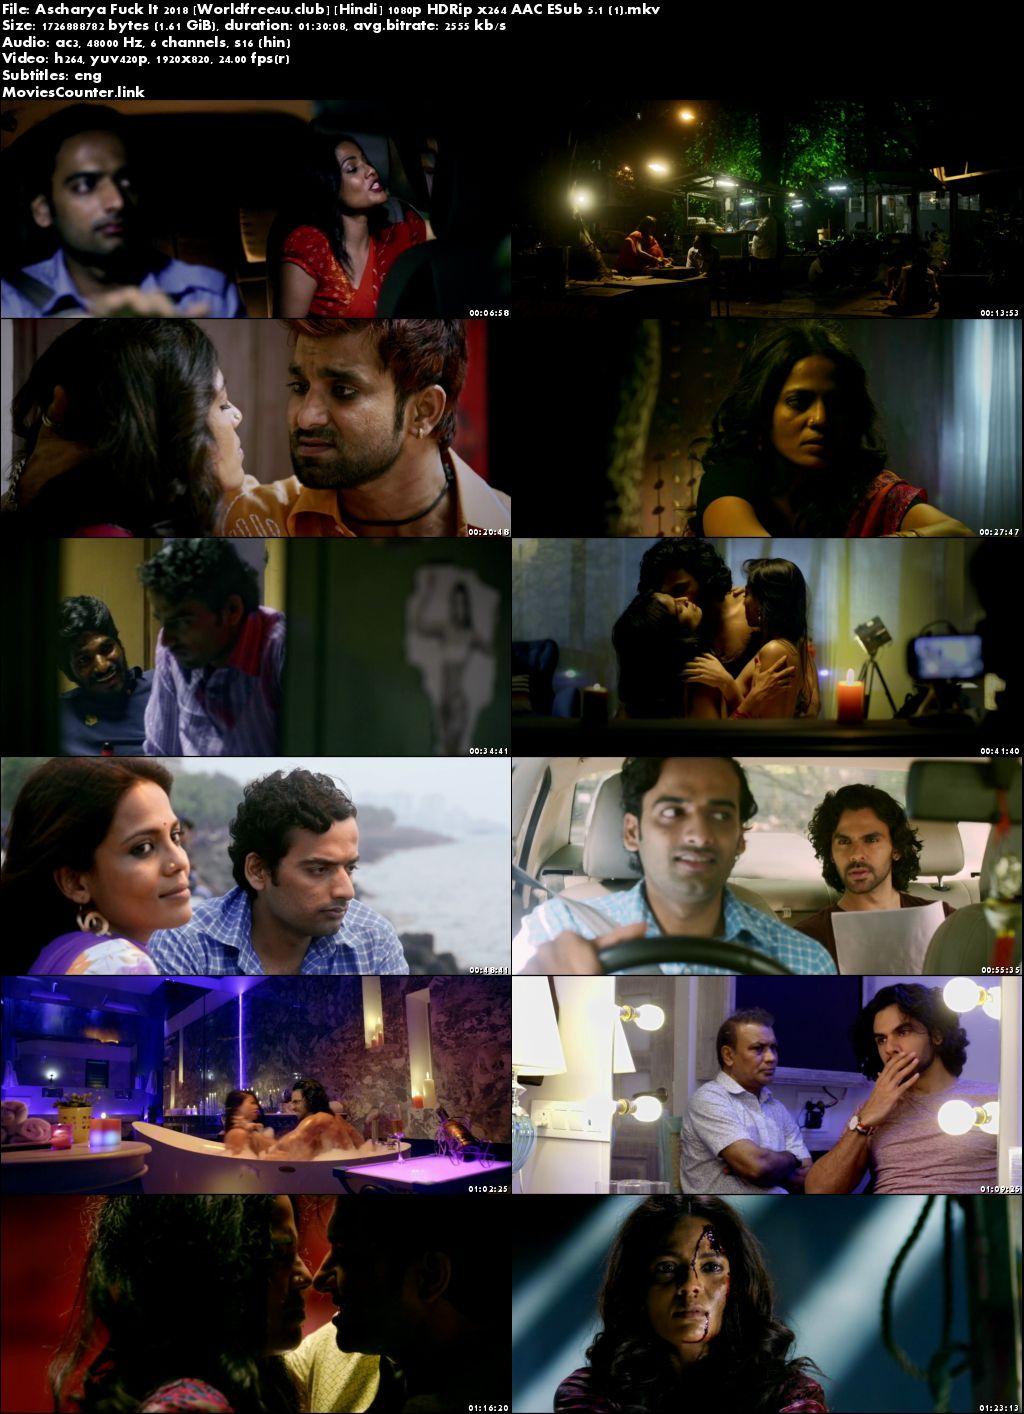 Screen Shots Ascharya Fuck It 2018 Hindi HD 1080p